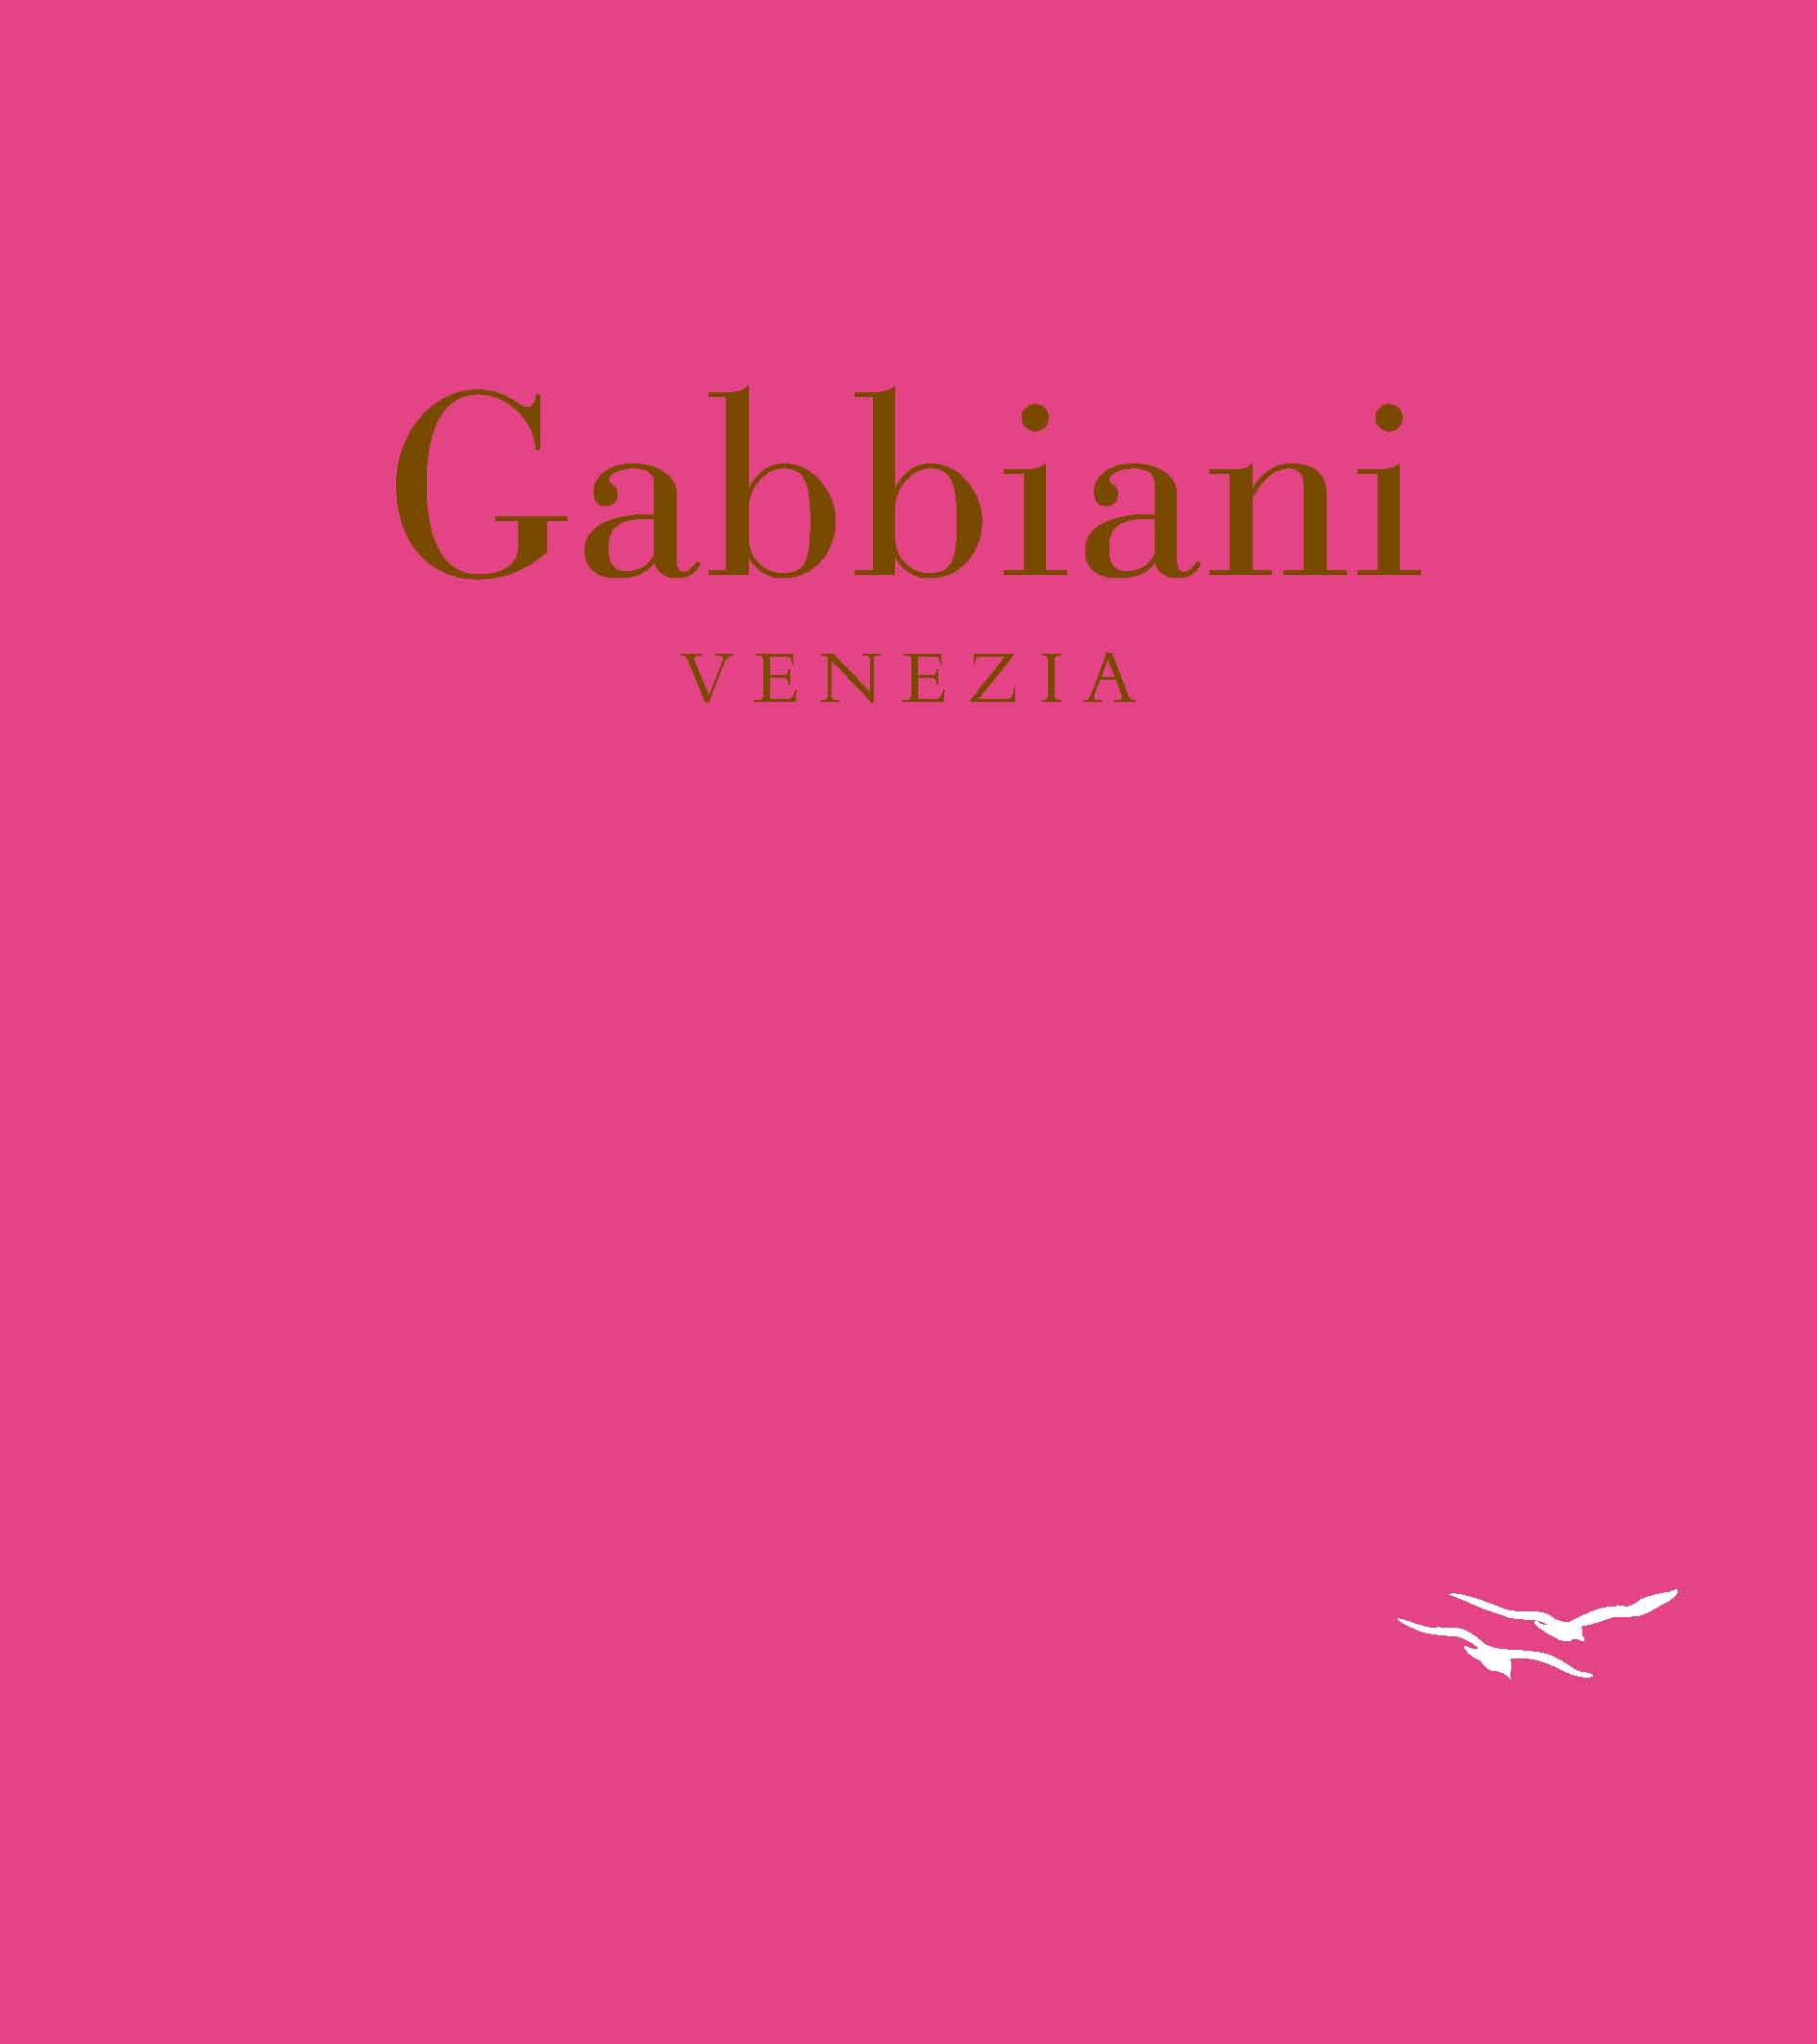 Gabbiani venezia